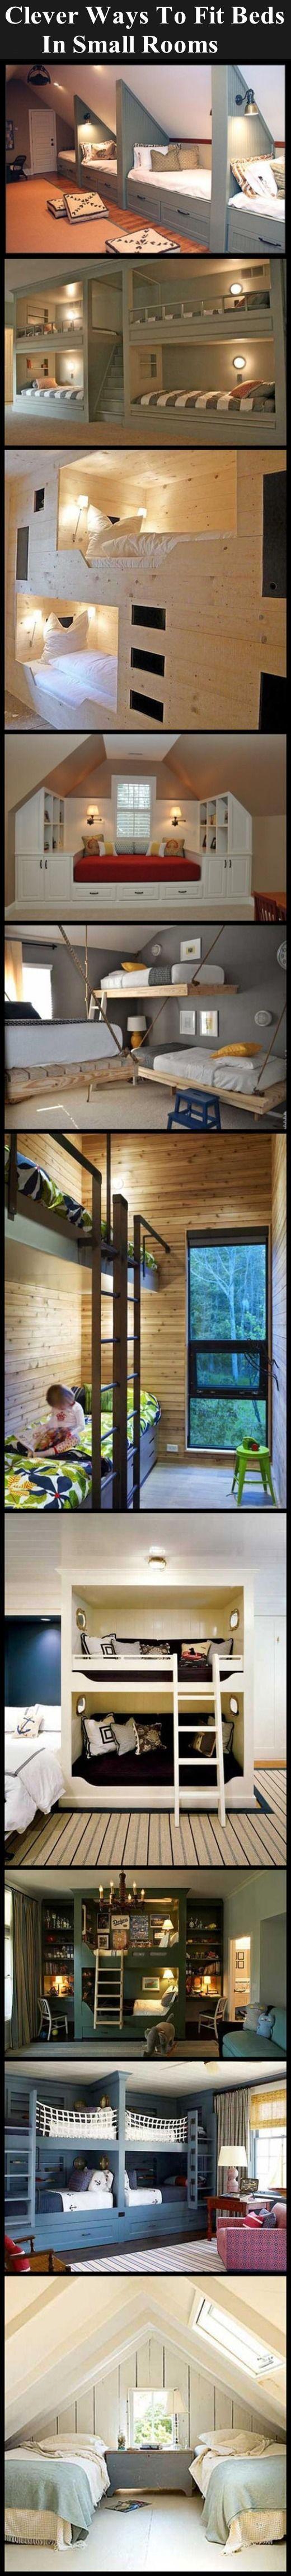 best 10 small bunk beds ideas on pinterest cabin beds for boys best 10 small bunk beds ideas on pinterest cabin beds for boys short bunk beds and low bunk beds